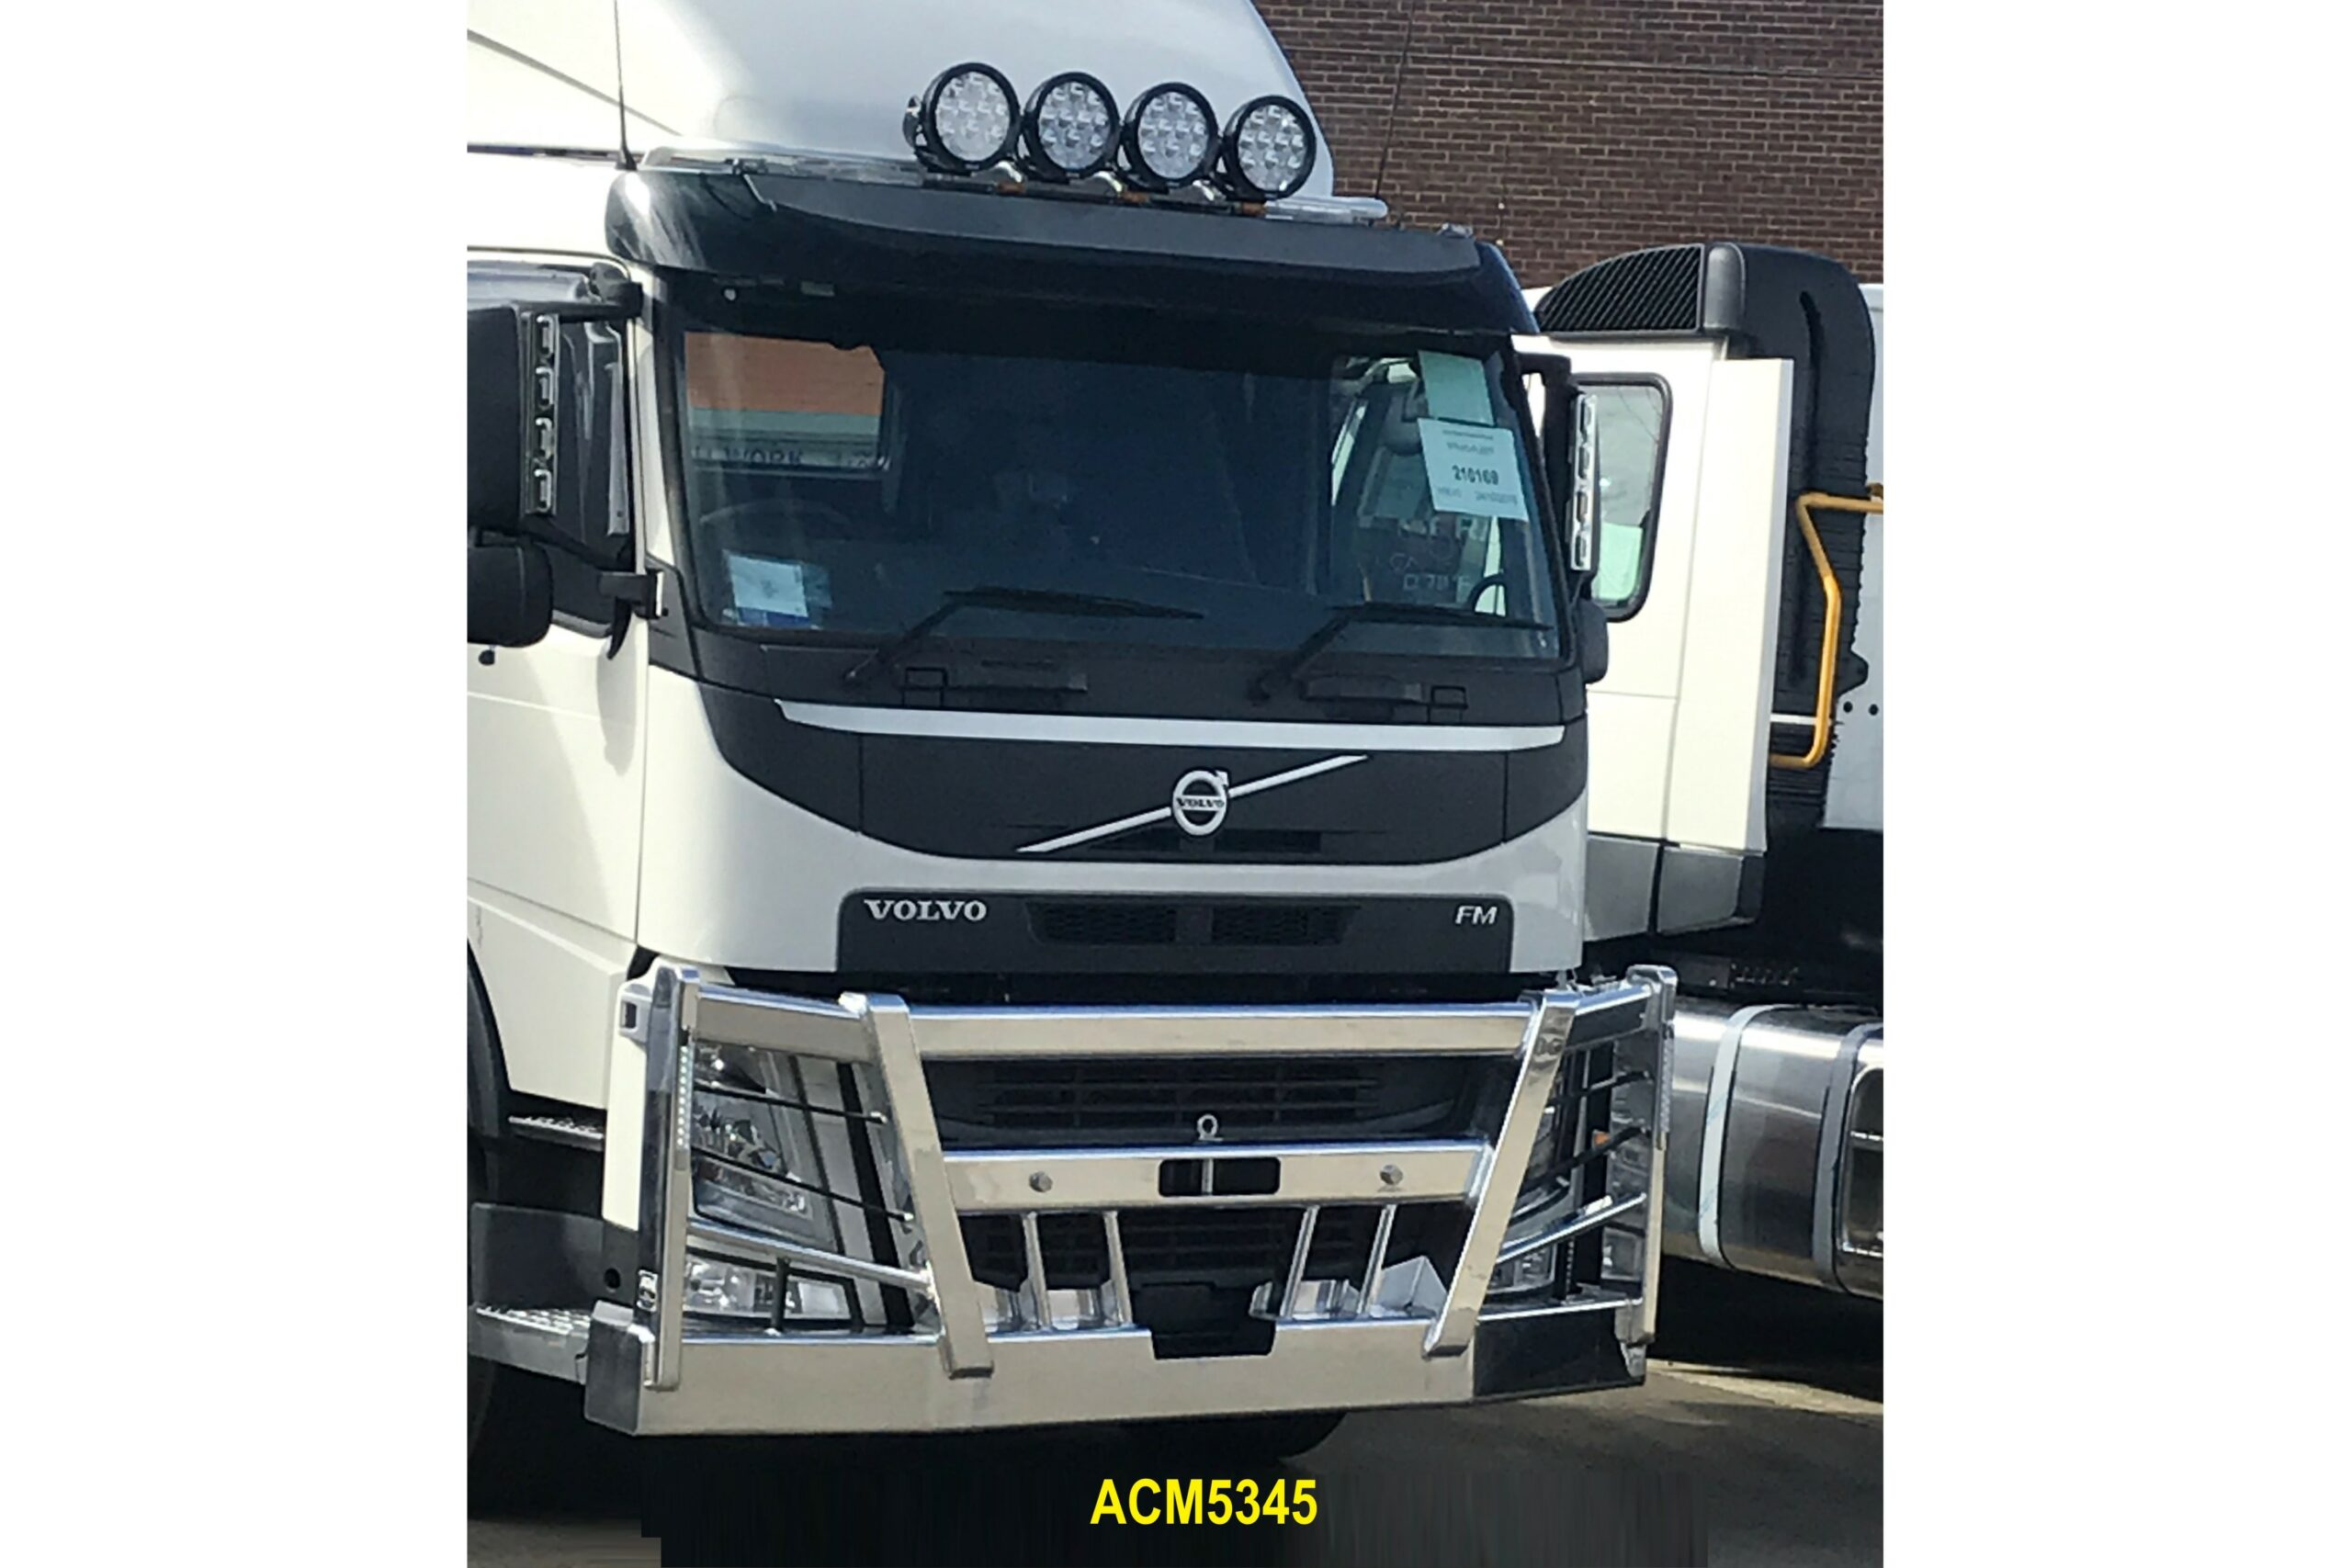 Acm5345 Volvo Fm 14+ Bullbar 4post No Light Bars.supple